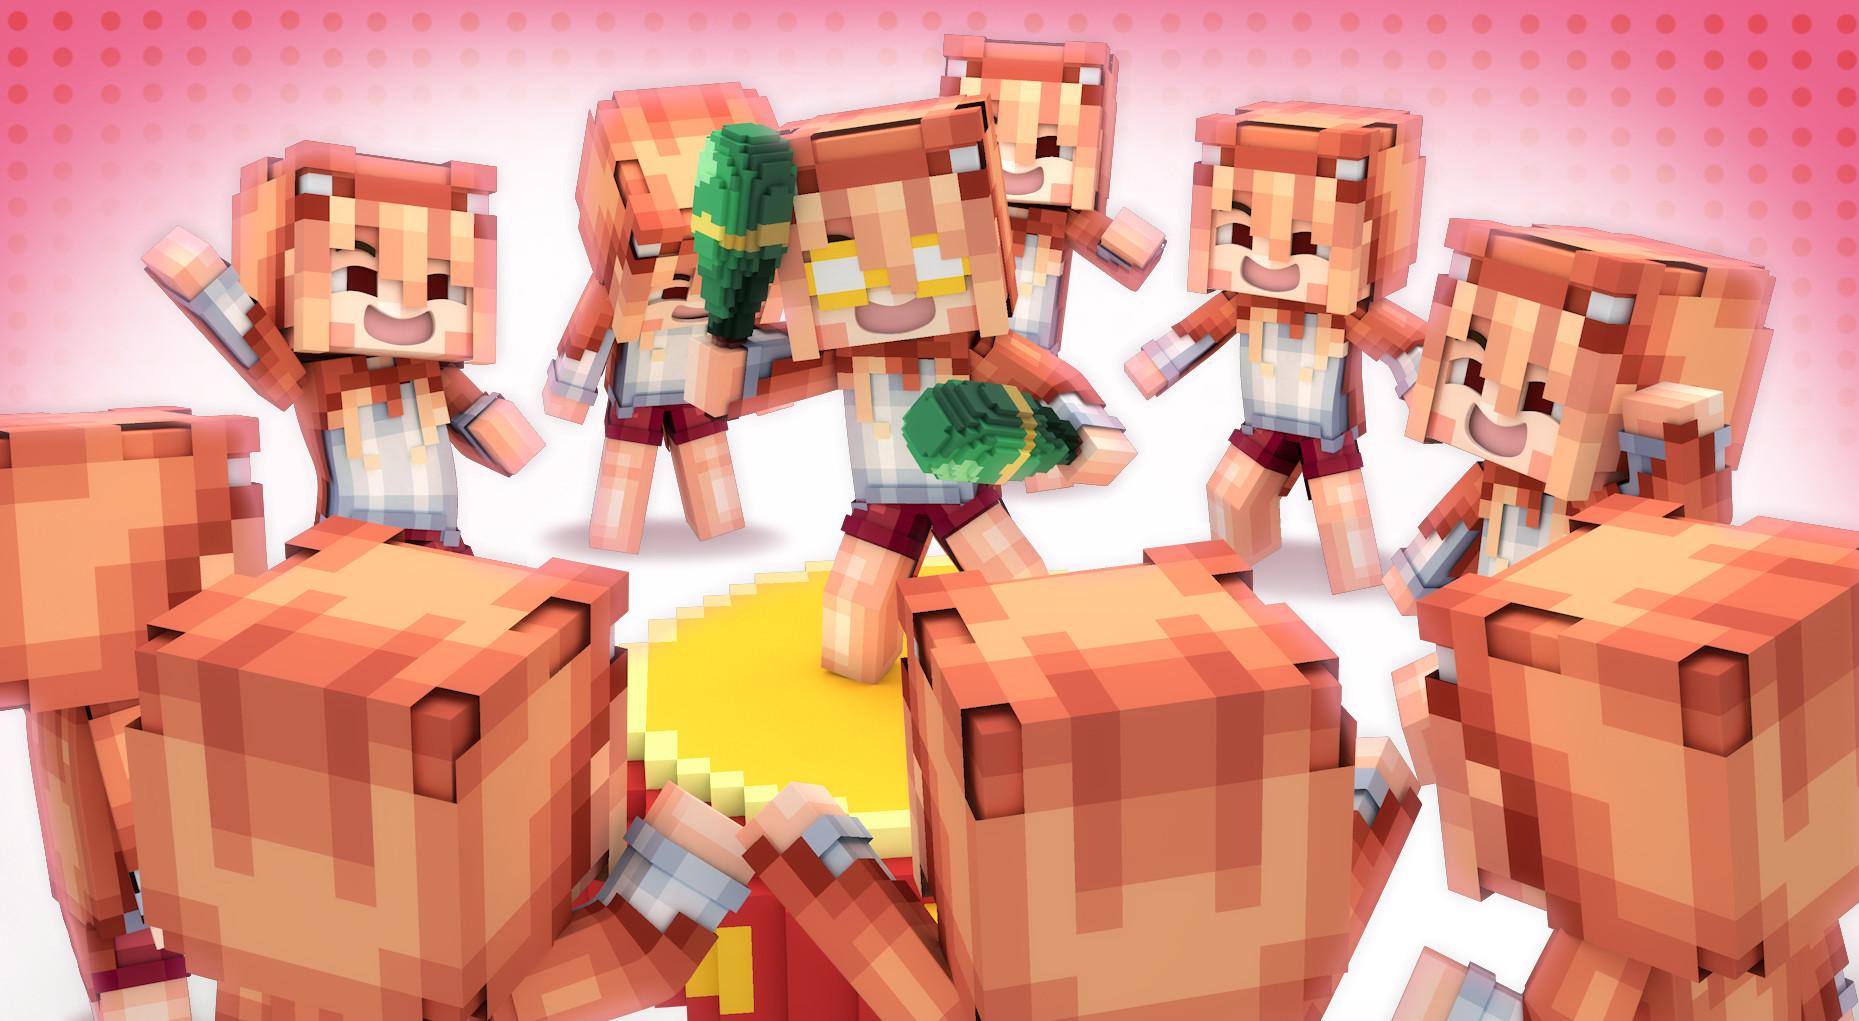 Supawit Oat Minecraft Wallpaper Himouto Umaru Chan